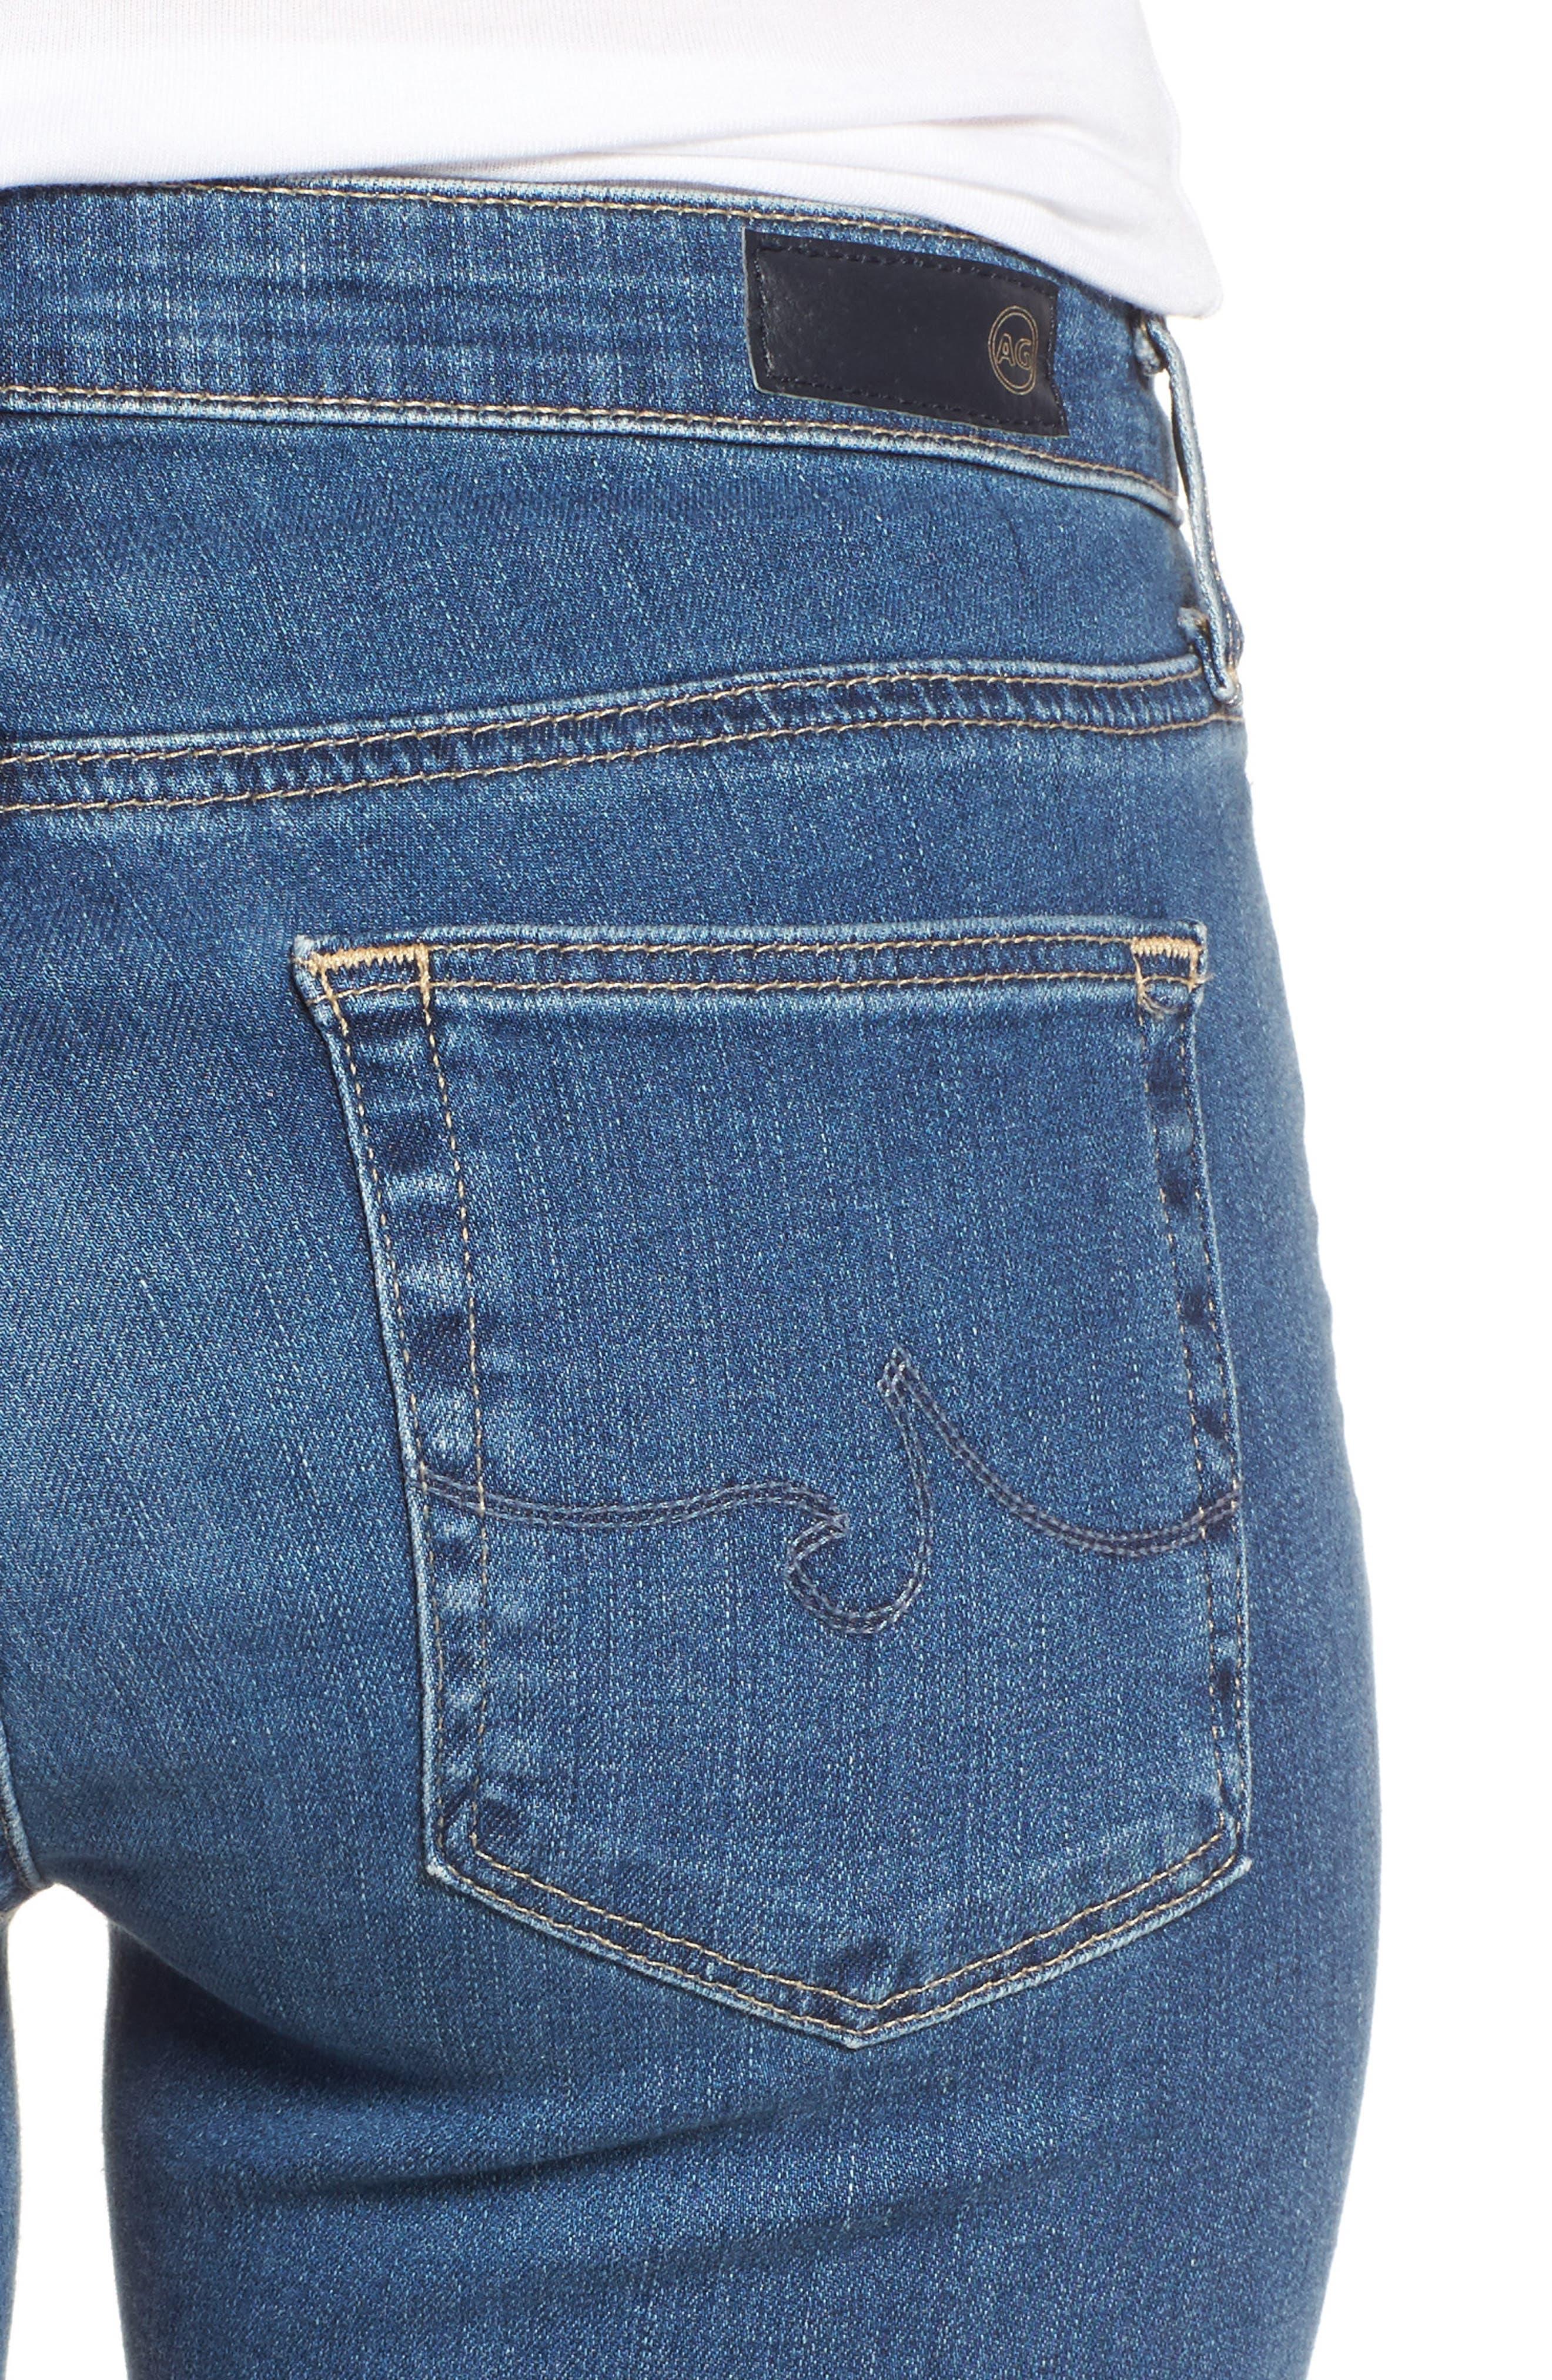 Prima Crop Skinny Jeans,                             Alternate thumbnail 4, color,                             416